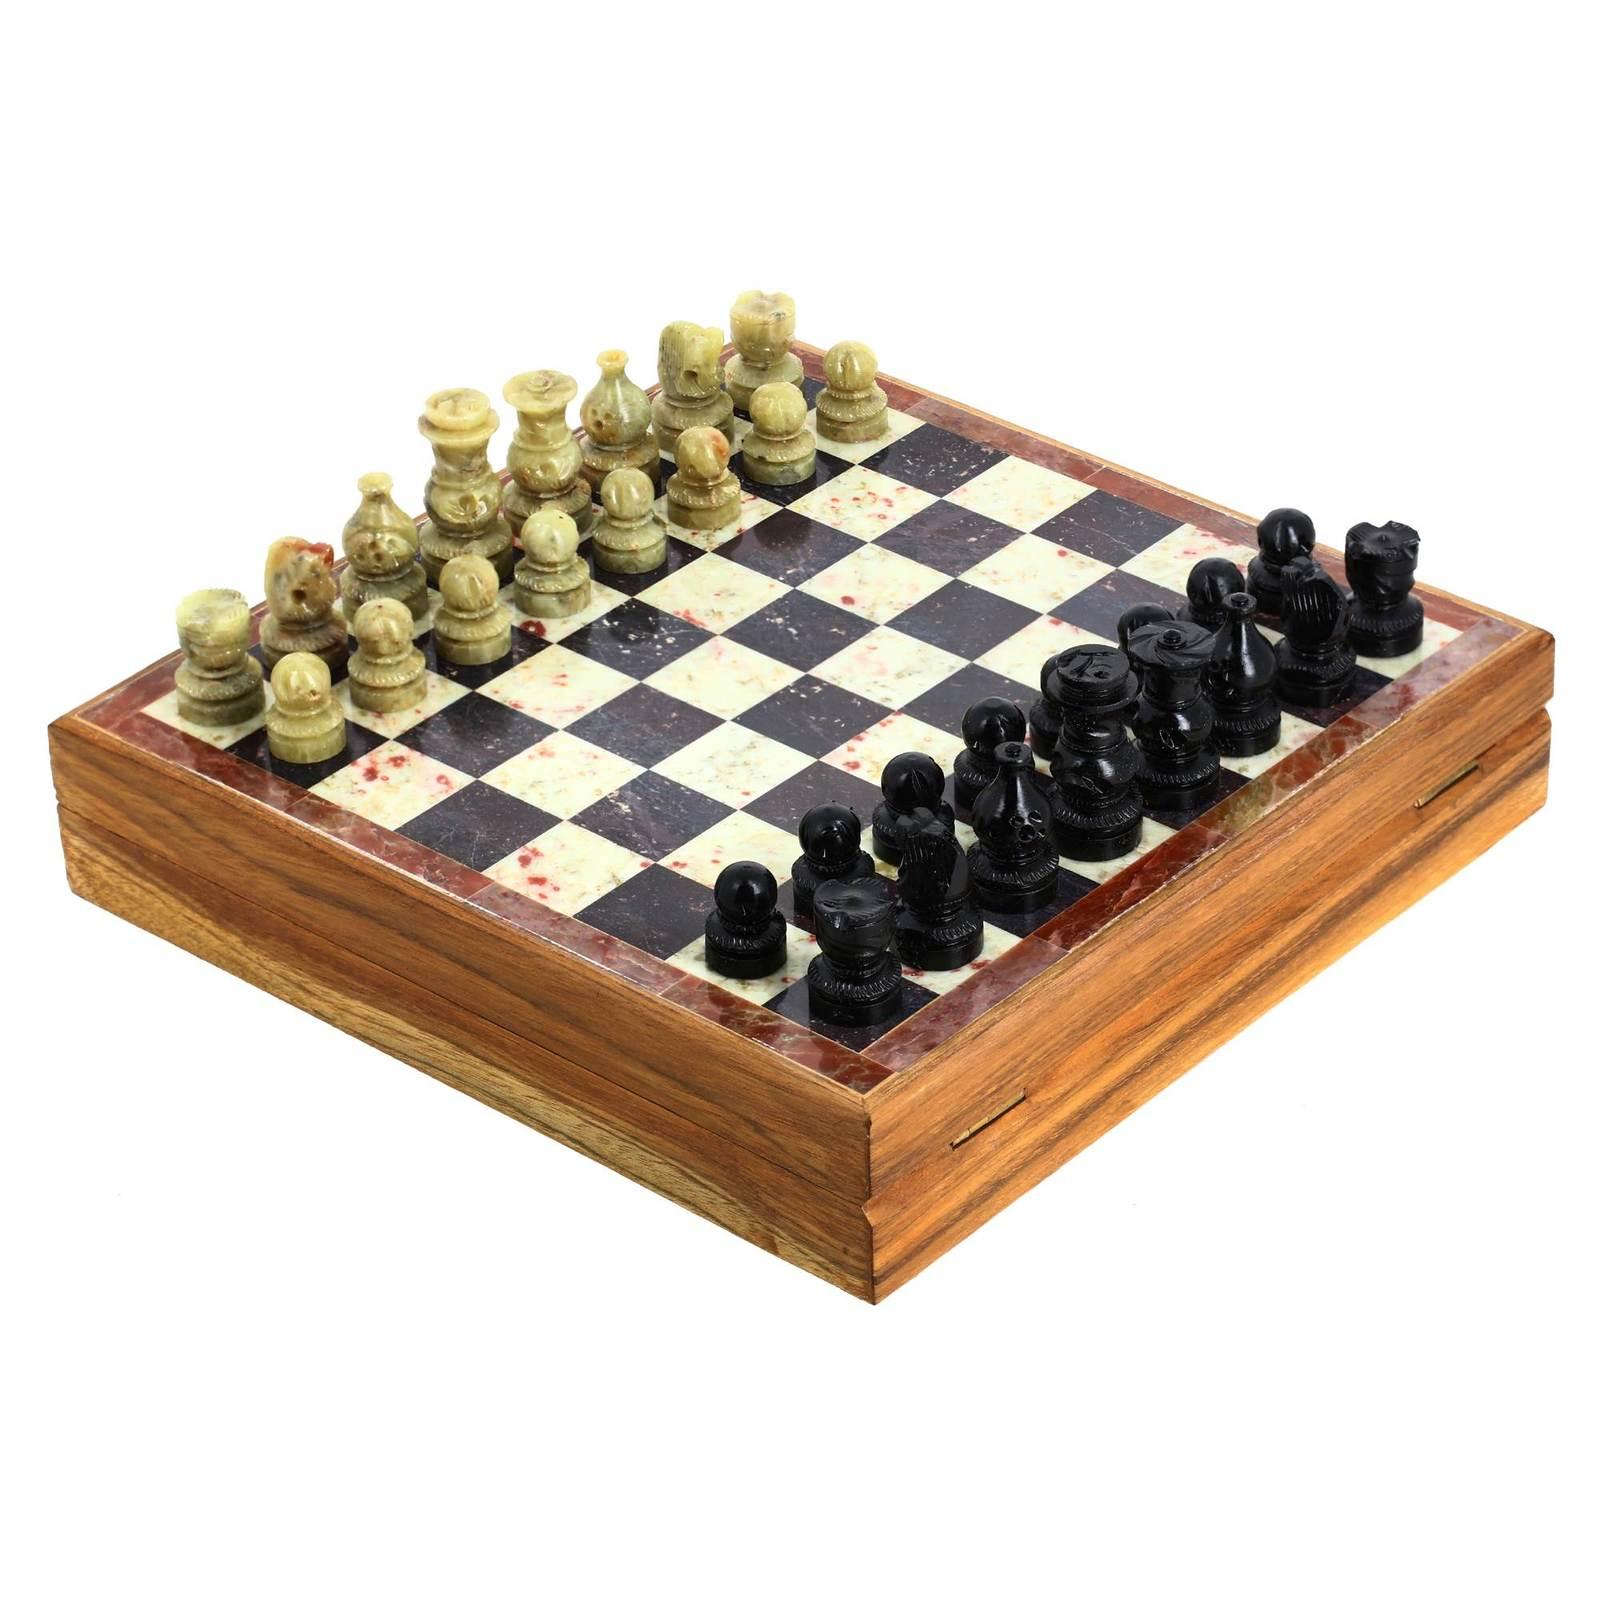 Shalinindia stone chess set 8 inch and 50 similar items - Granite chess set ...